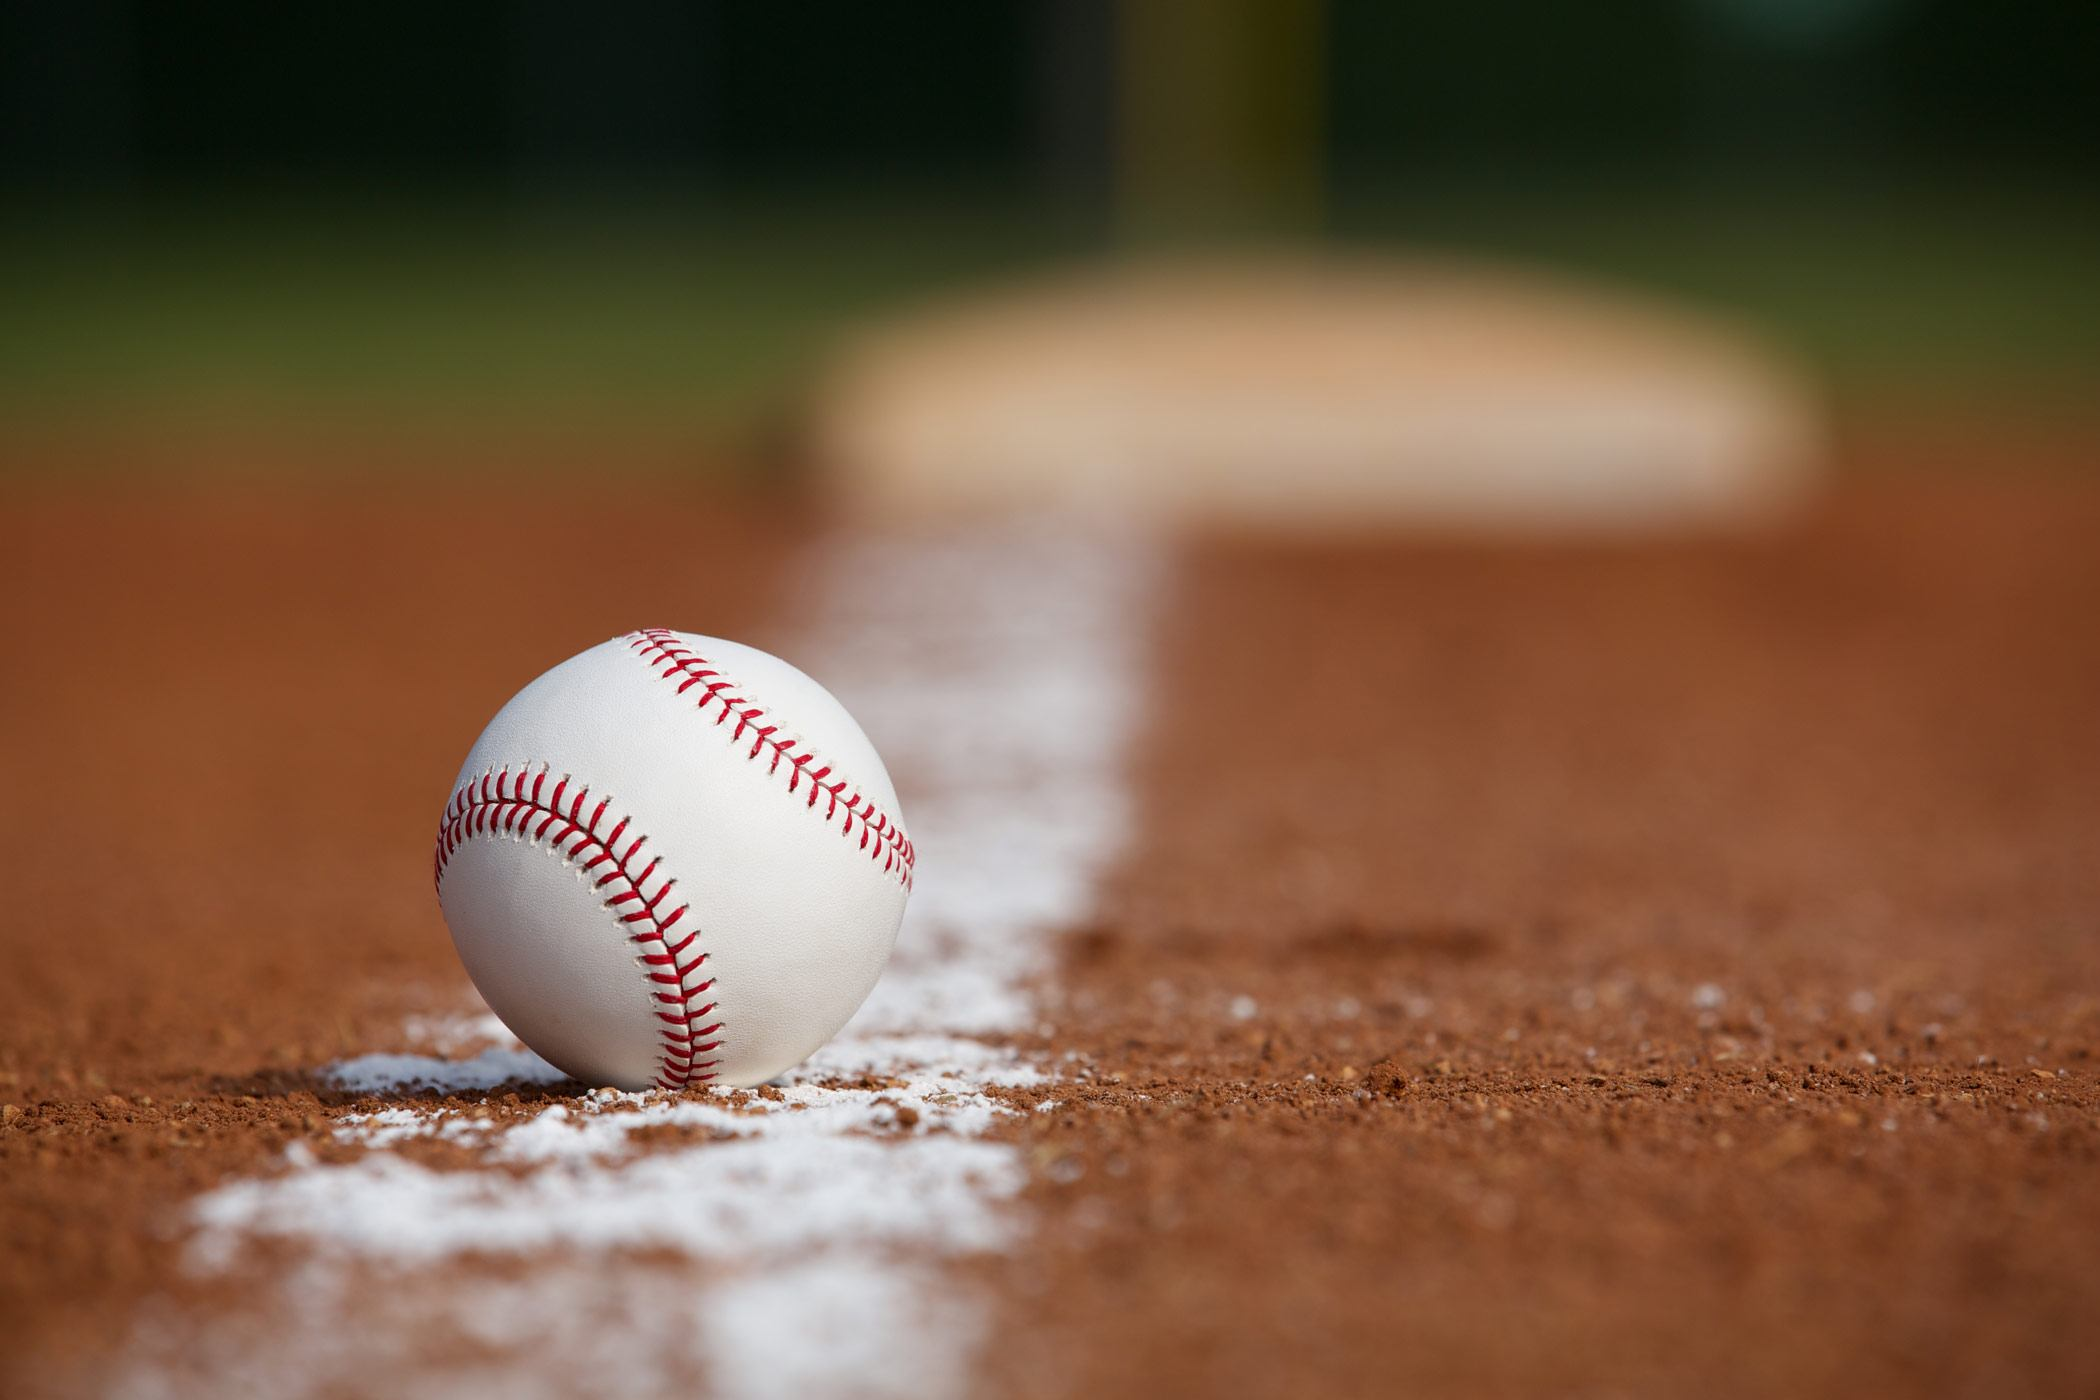 avenue-of-the-arts-costa-mesa-baseball